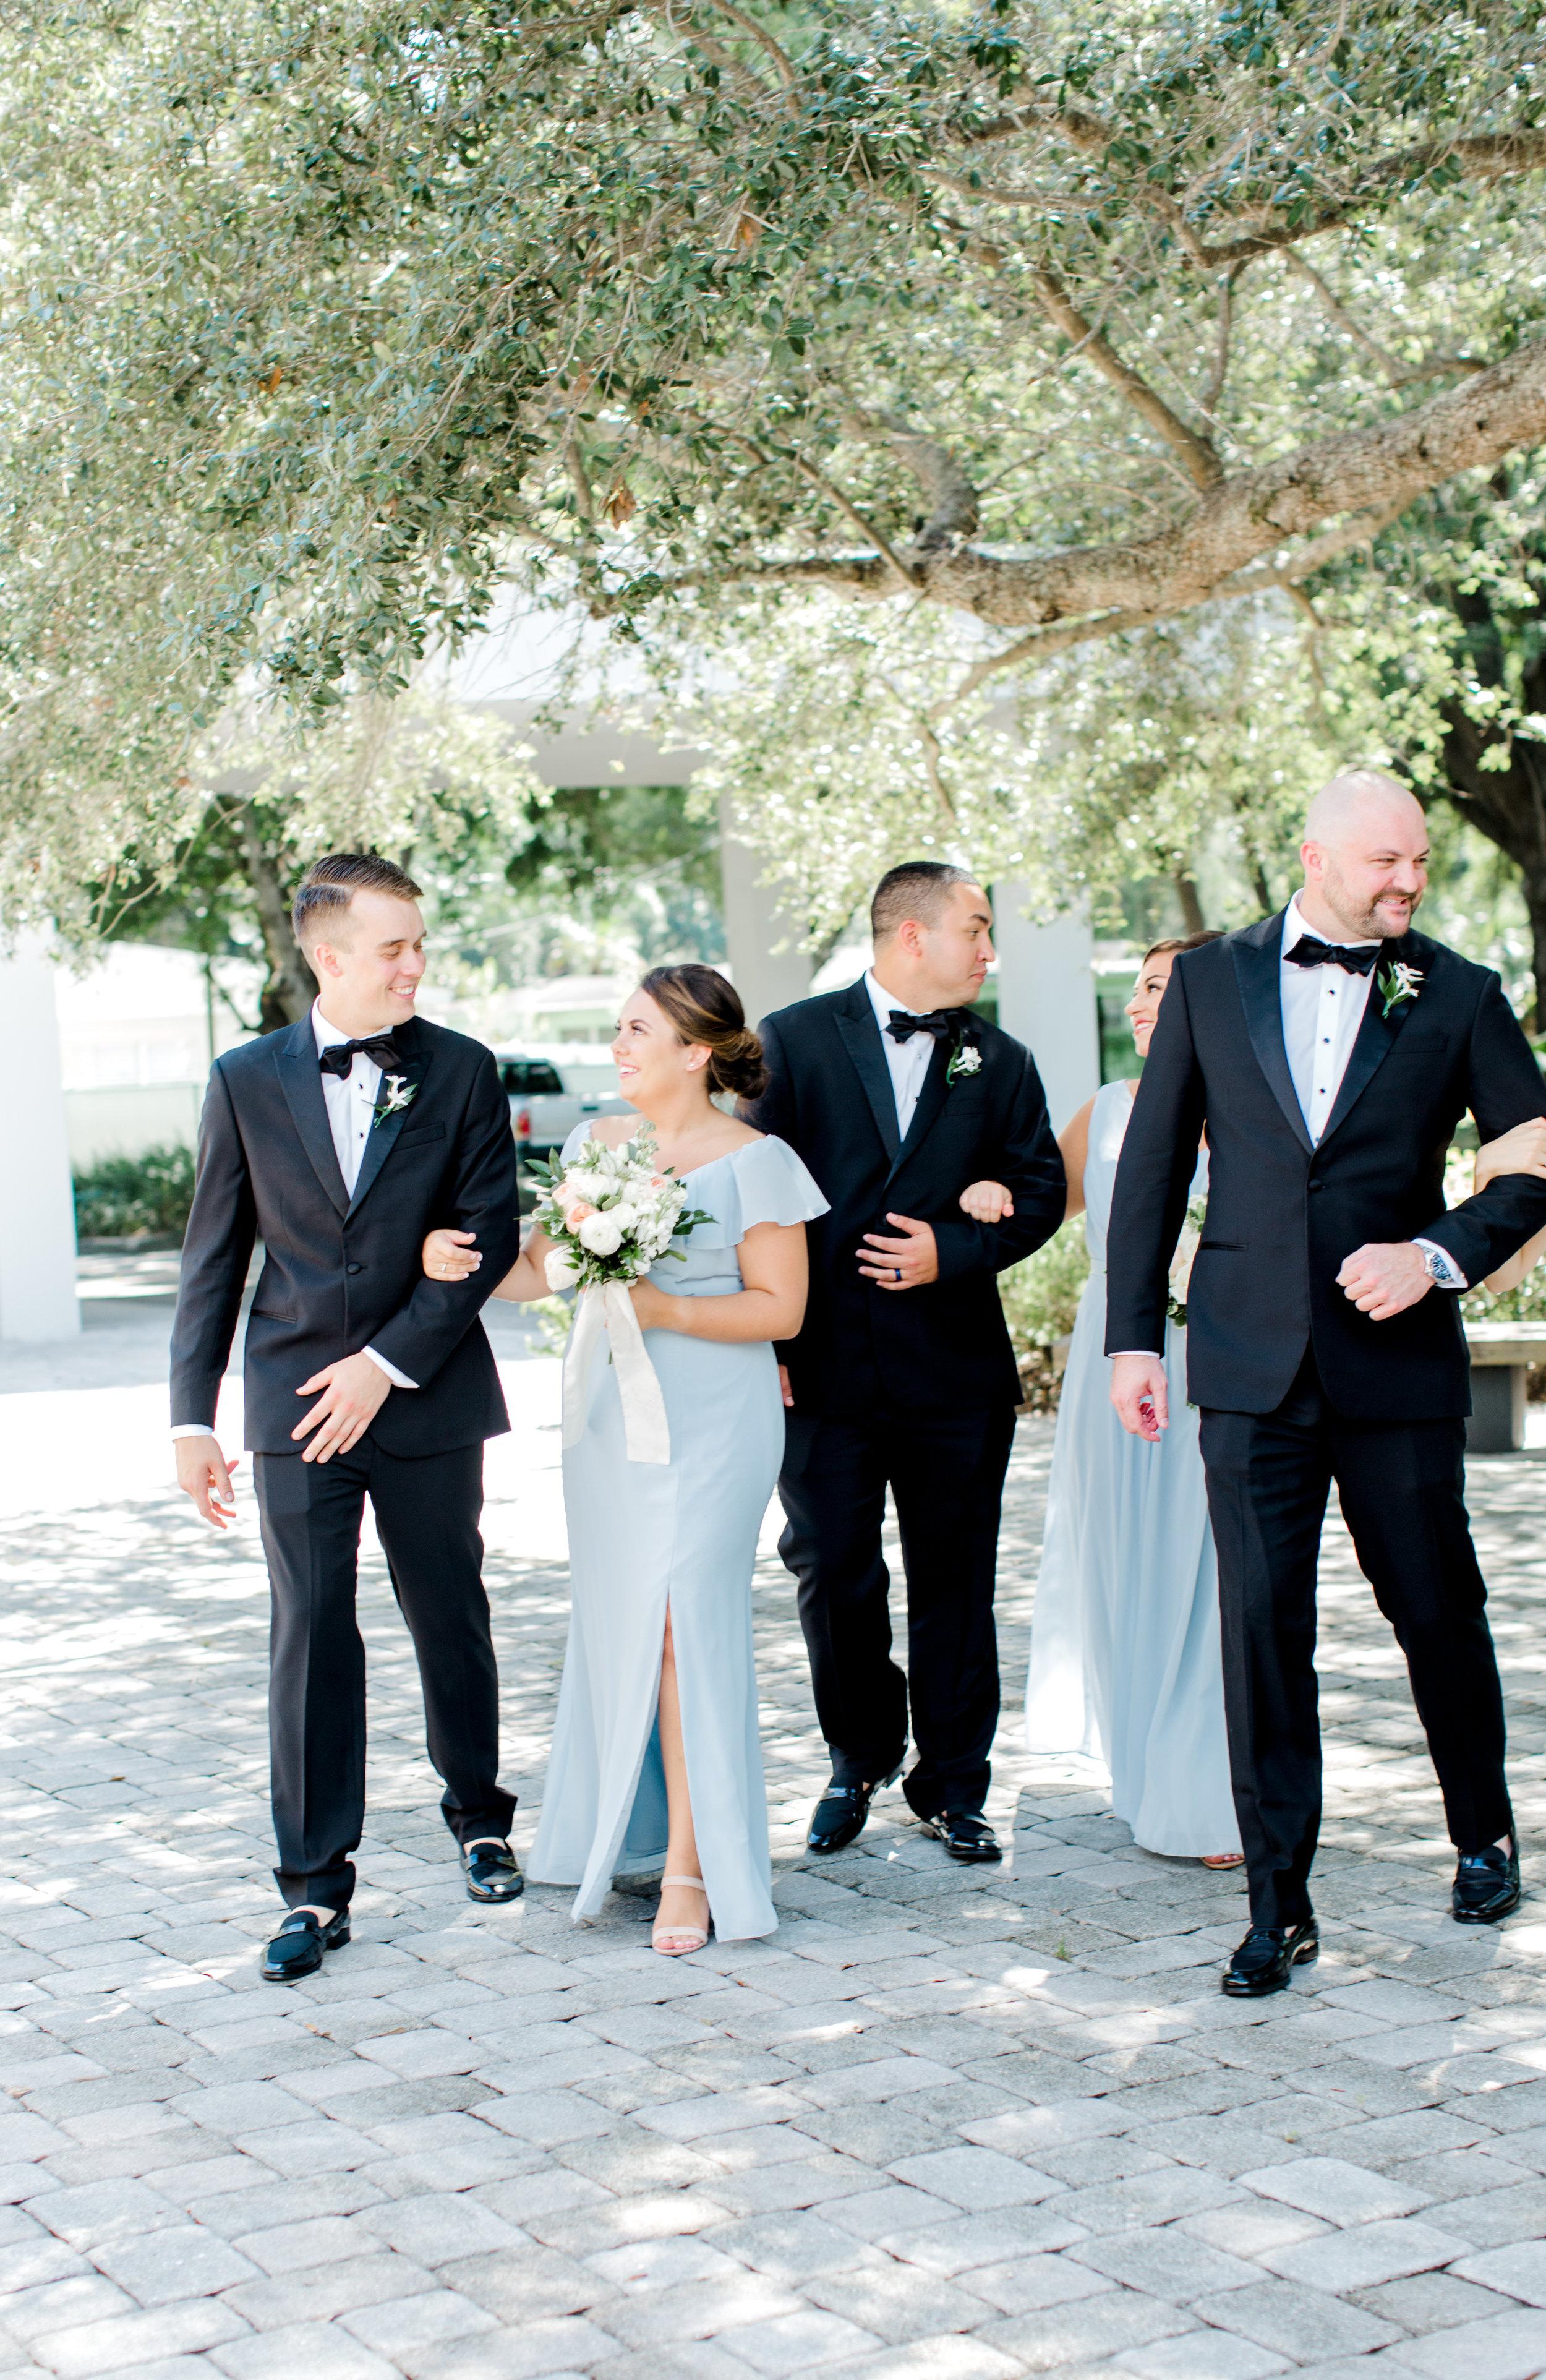 candid wedding party walking